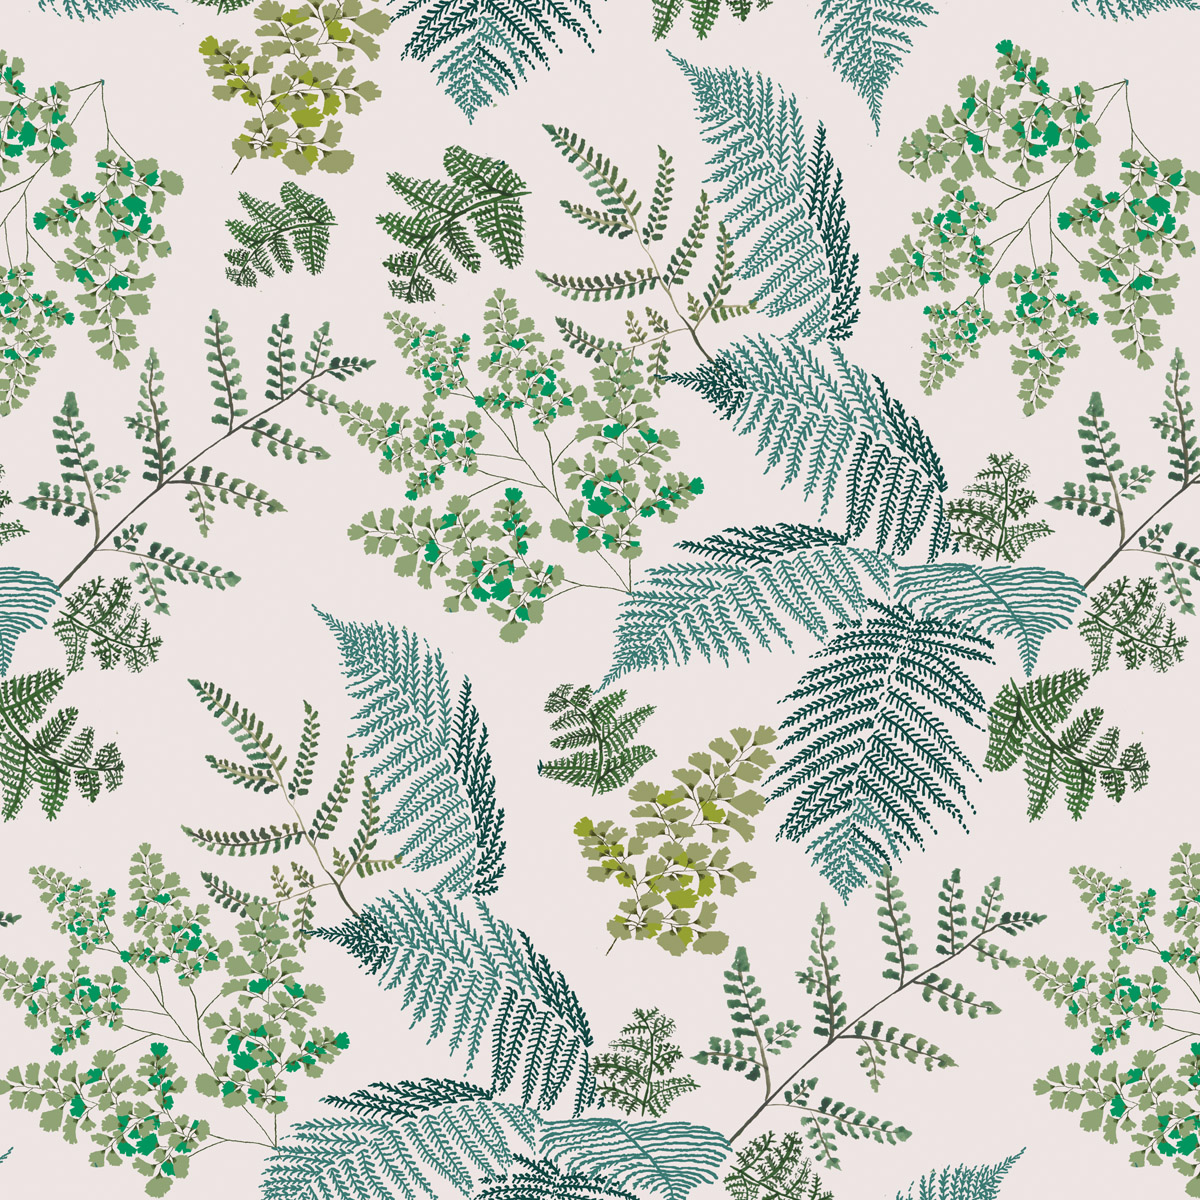 Lace Ferns Spring Green.jpg